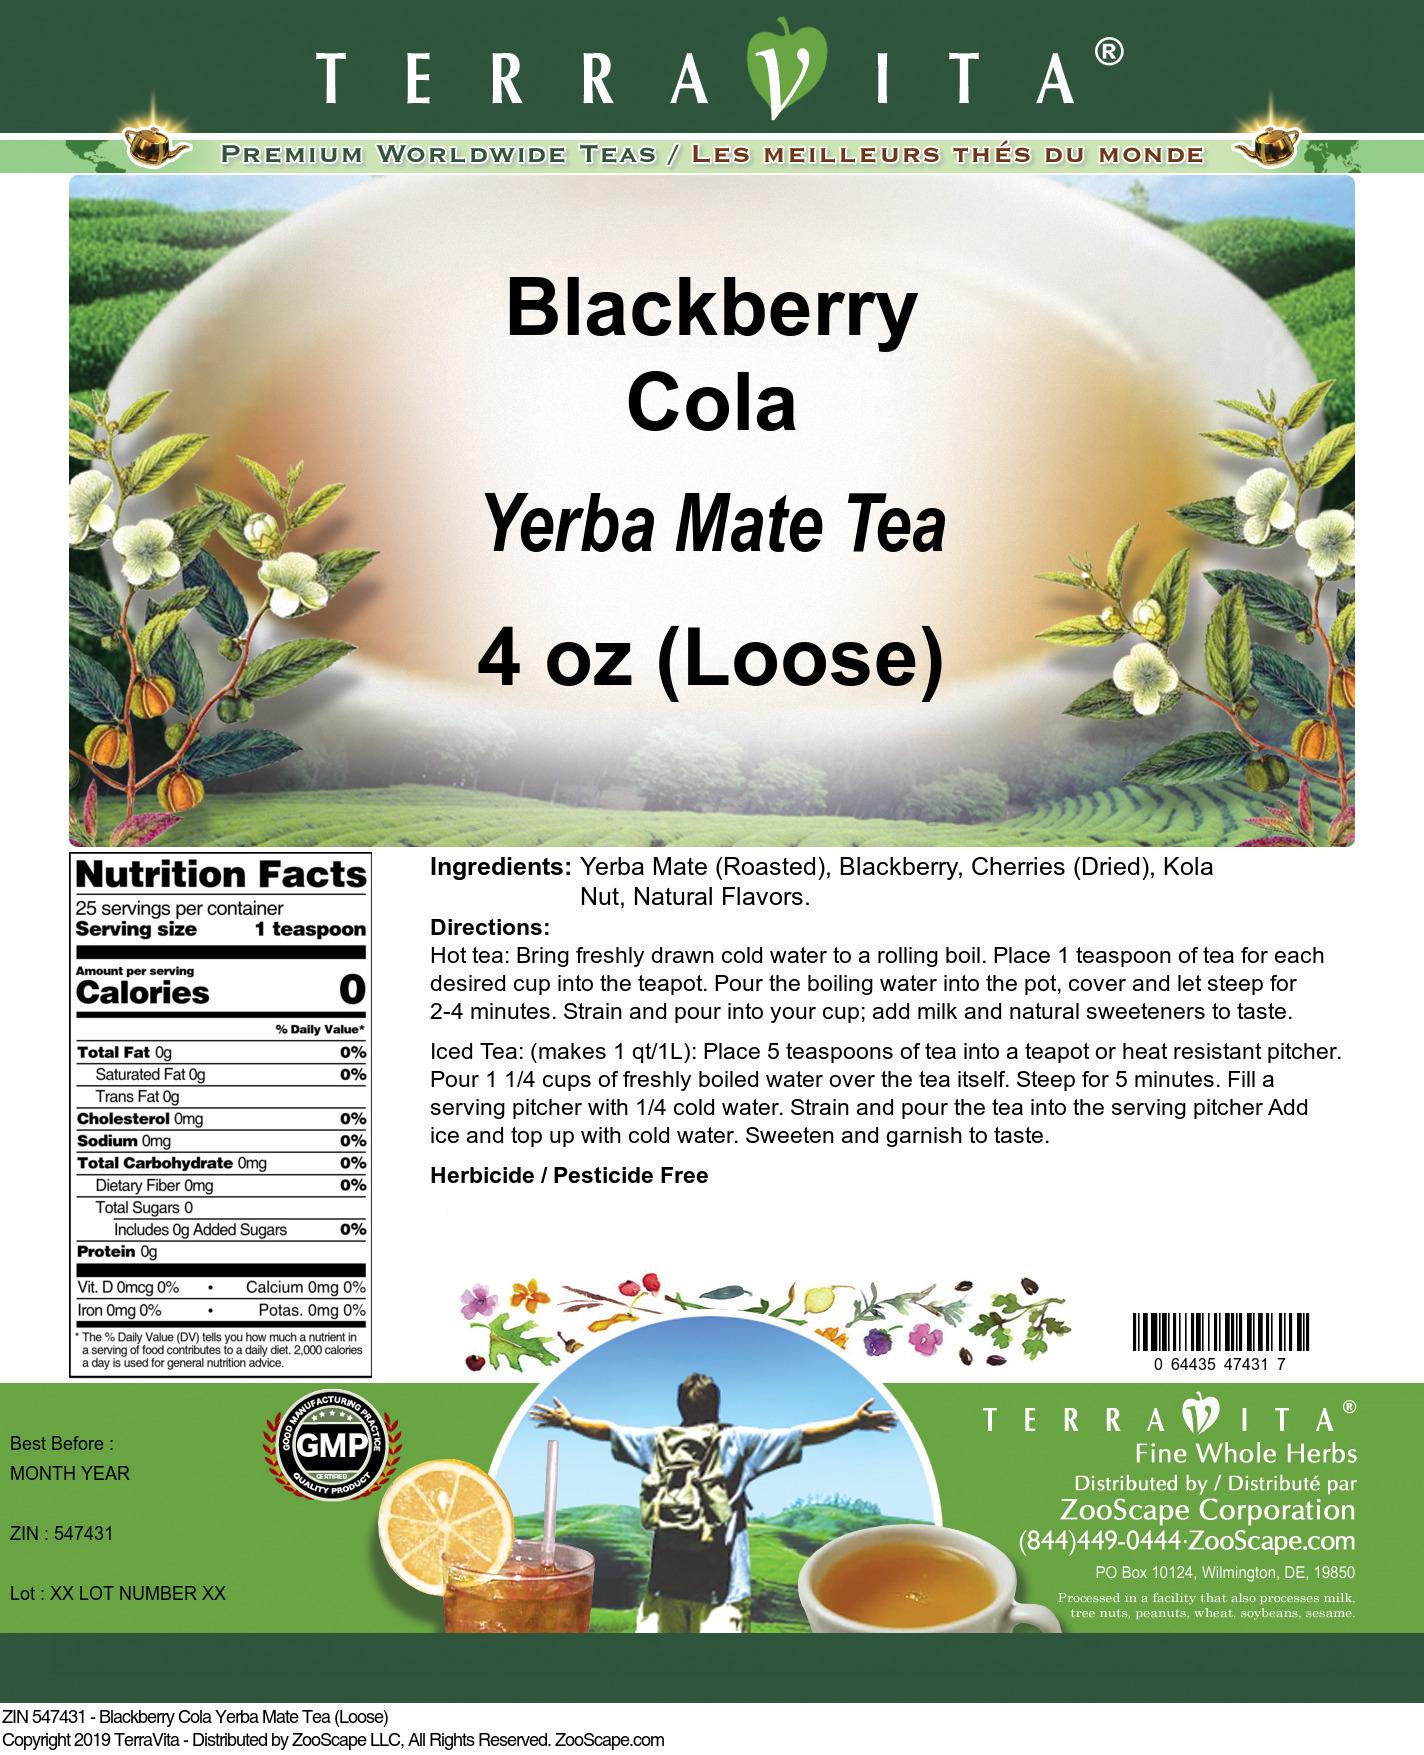 Blackberry Cola Yerba Mate